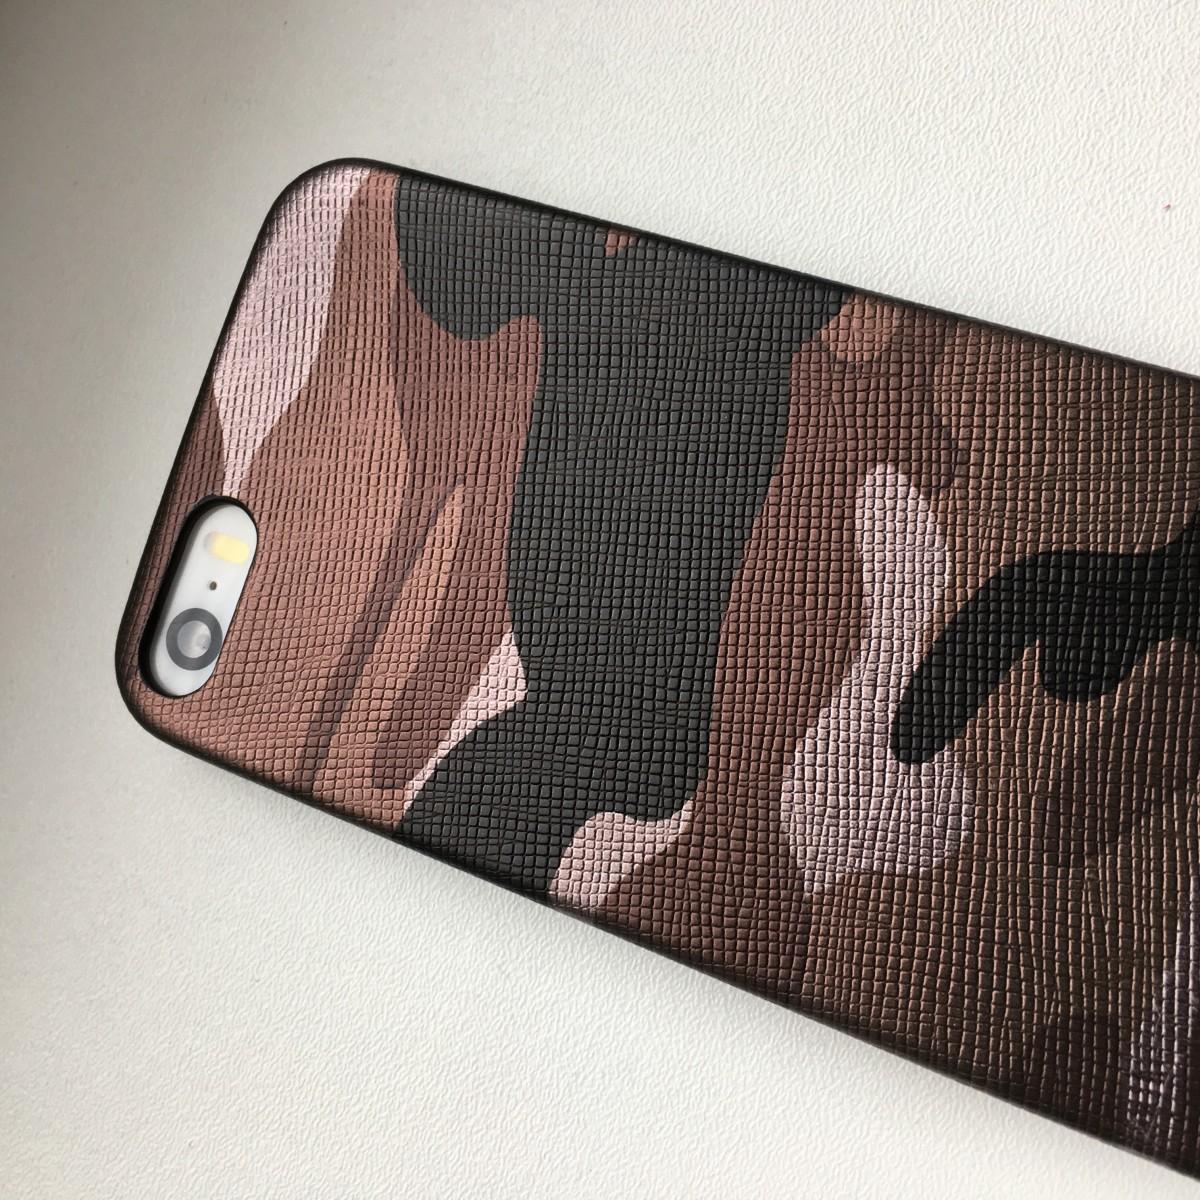 Pouzdro iMore Army Camouflage Apple iPhone SE/5S/5 - Hnědé